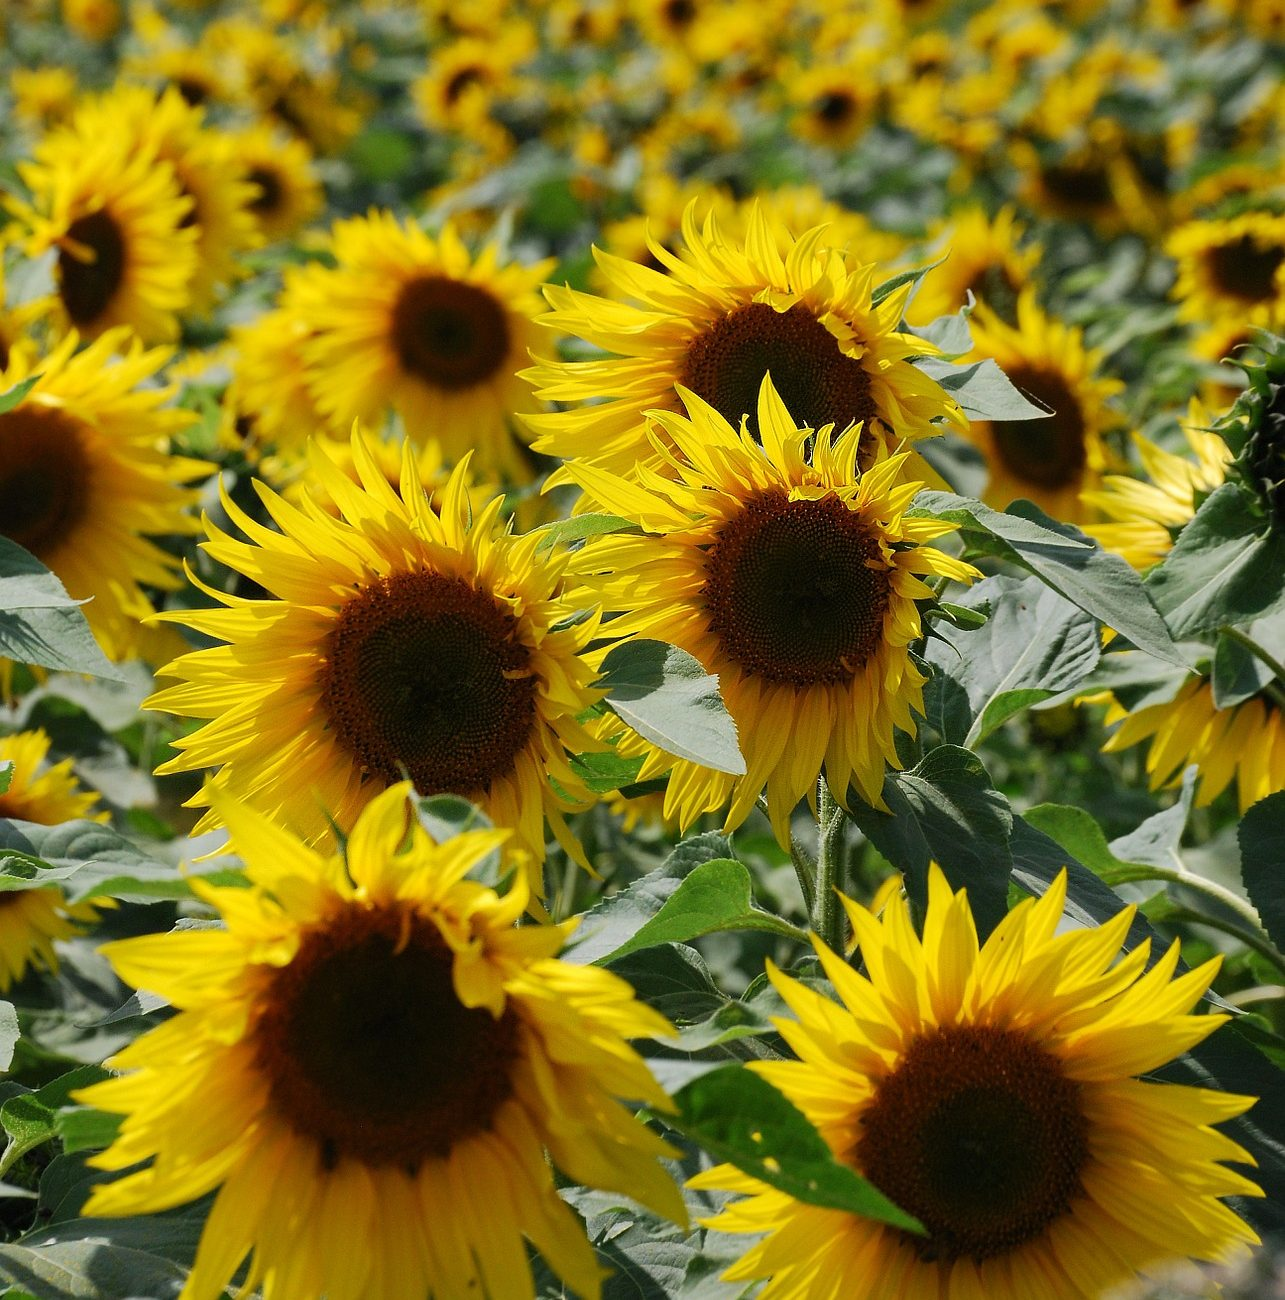 sunflower-369733_1920